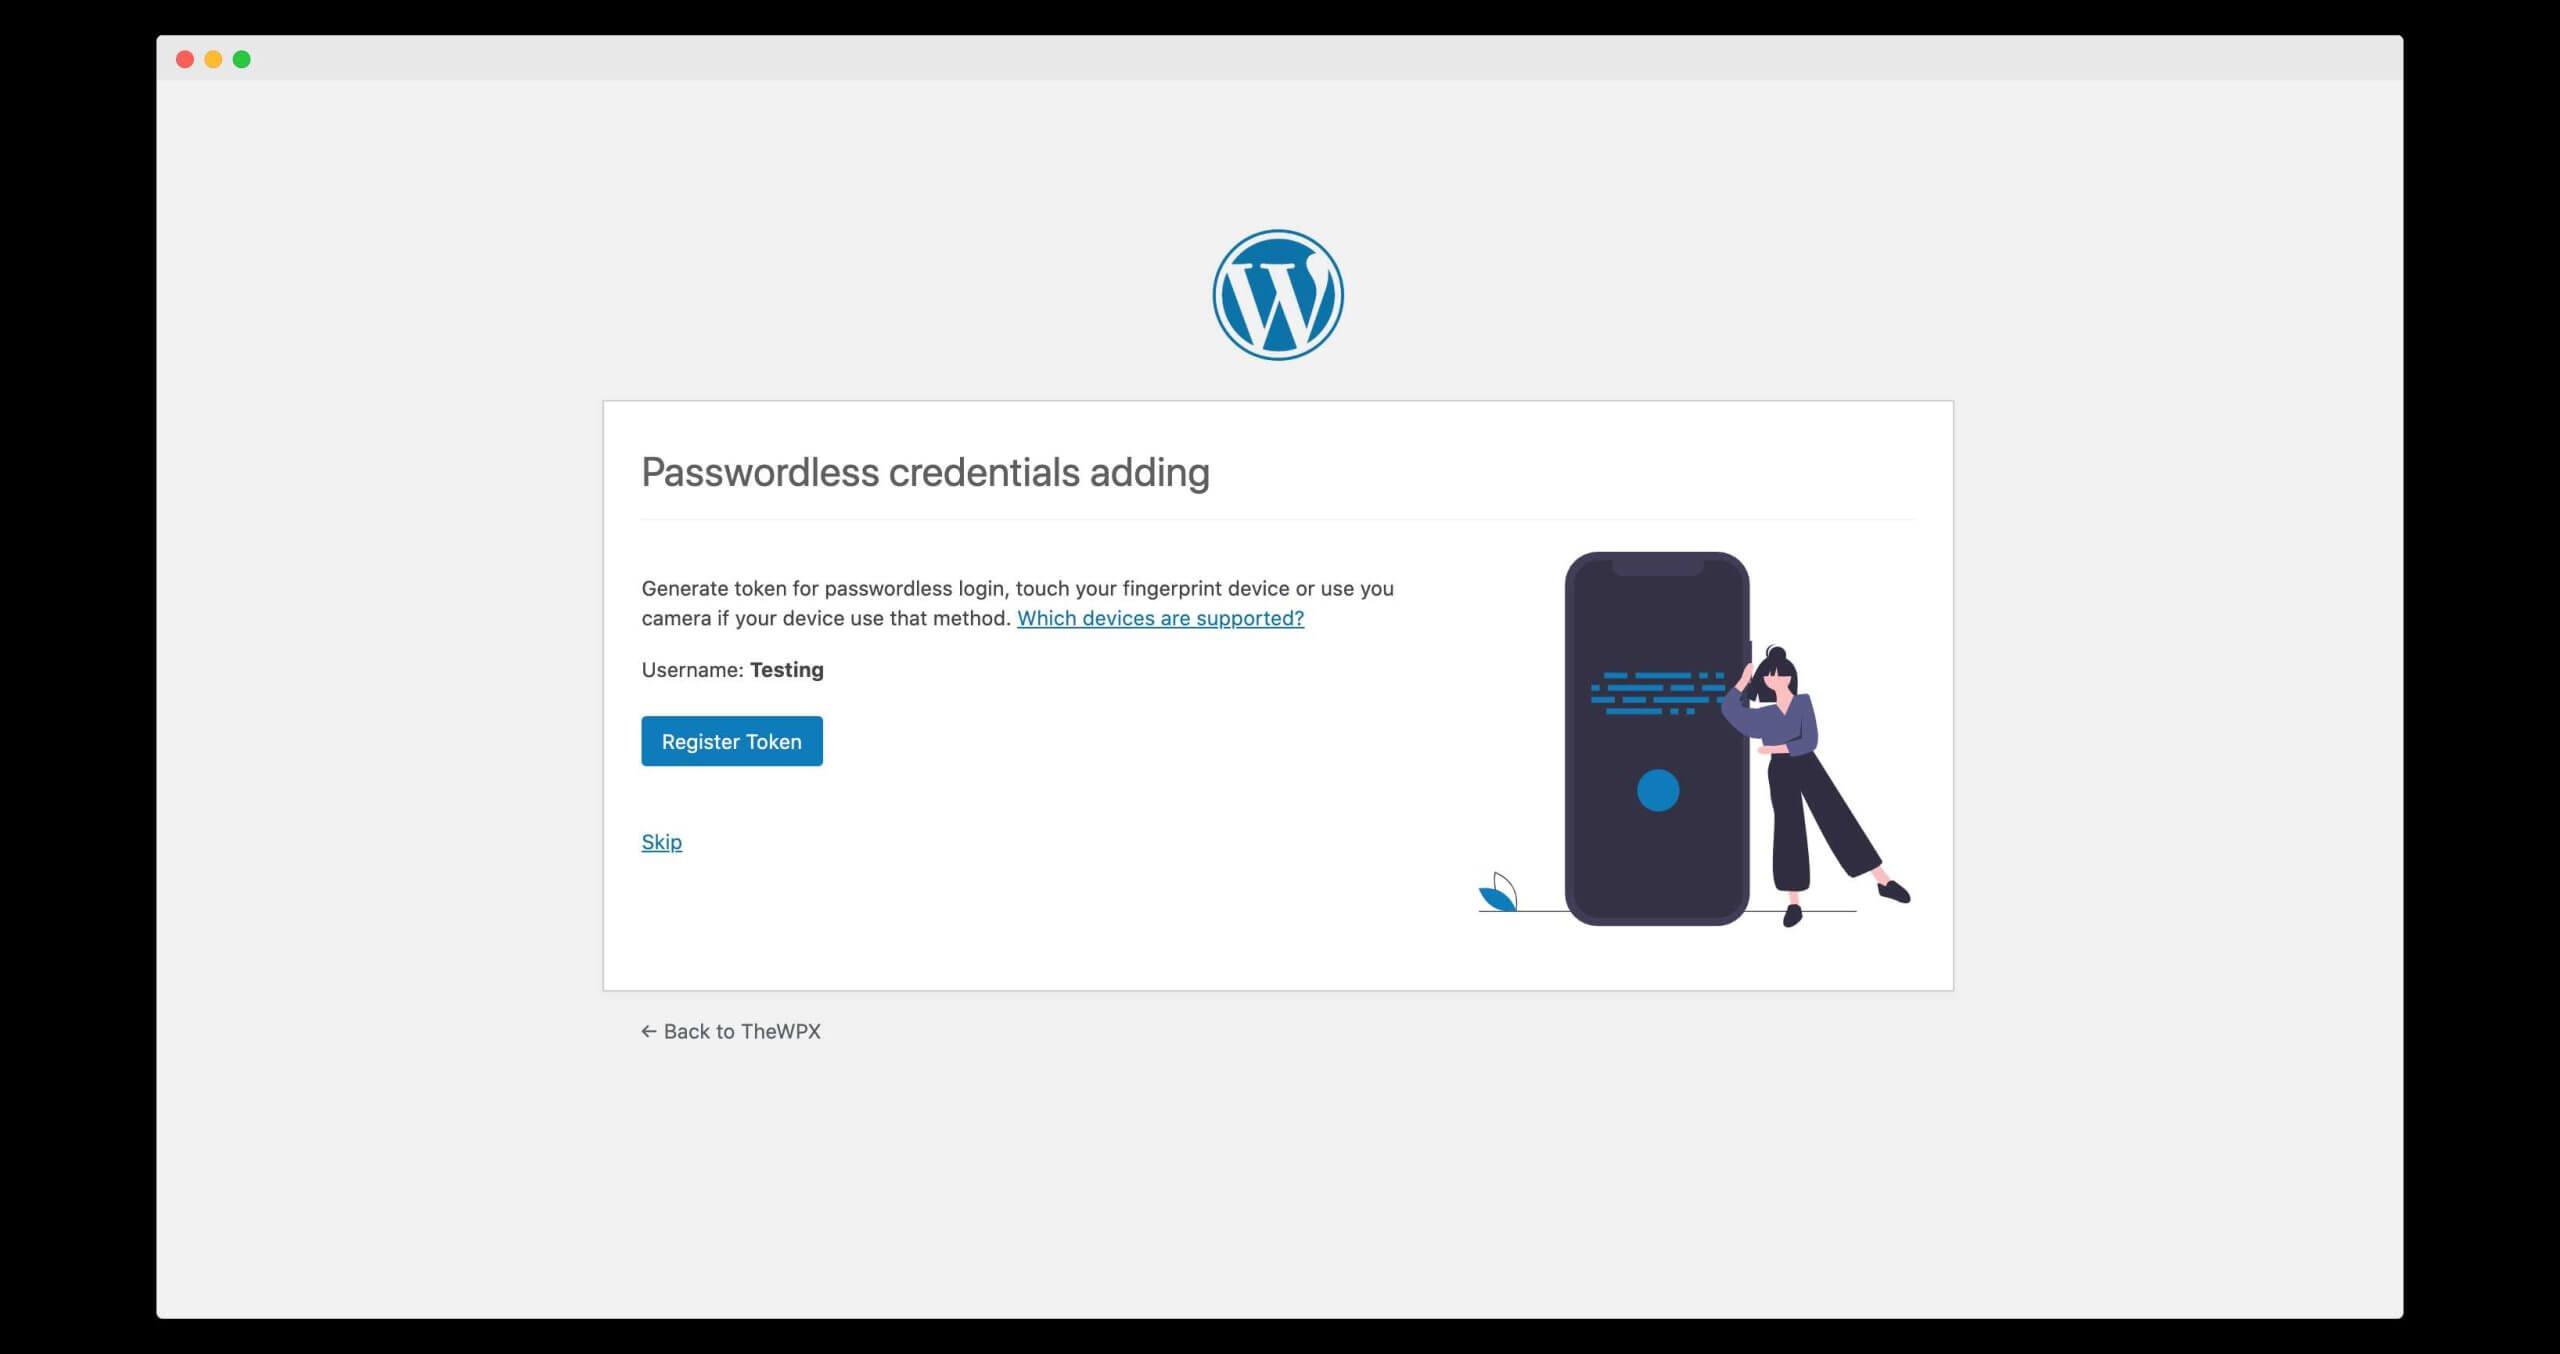 registering token for passwordless authentication